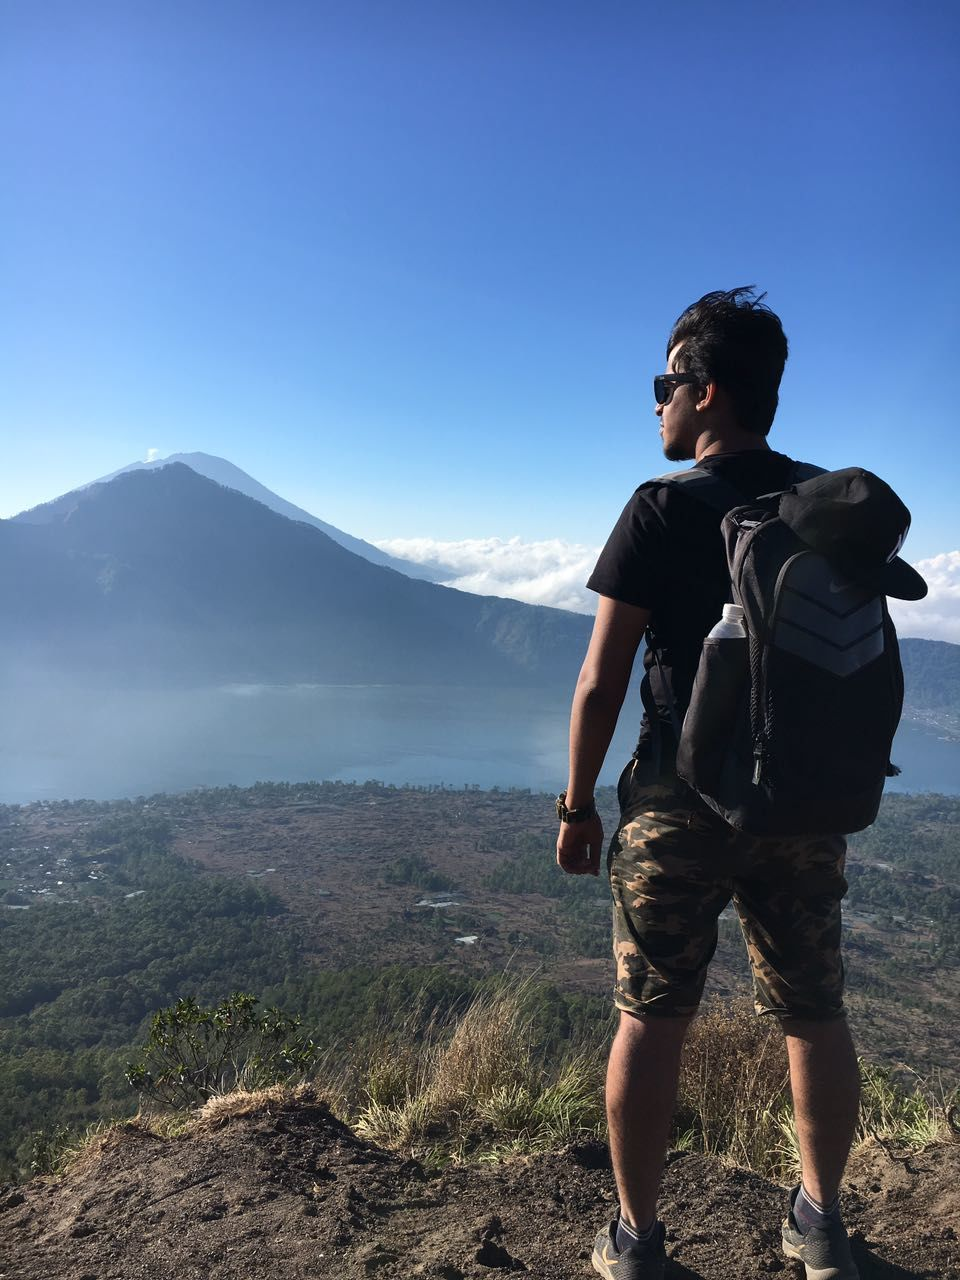 Photo of Mount Batur Volcano Sunrise Trekking By Rikin Shah